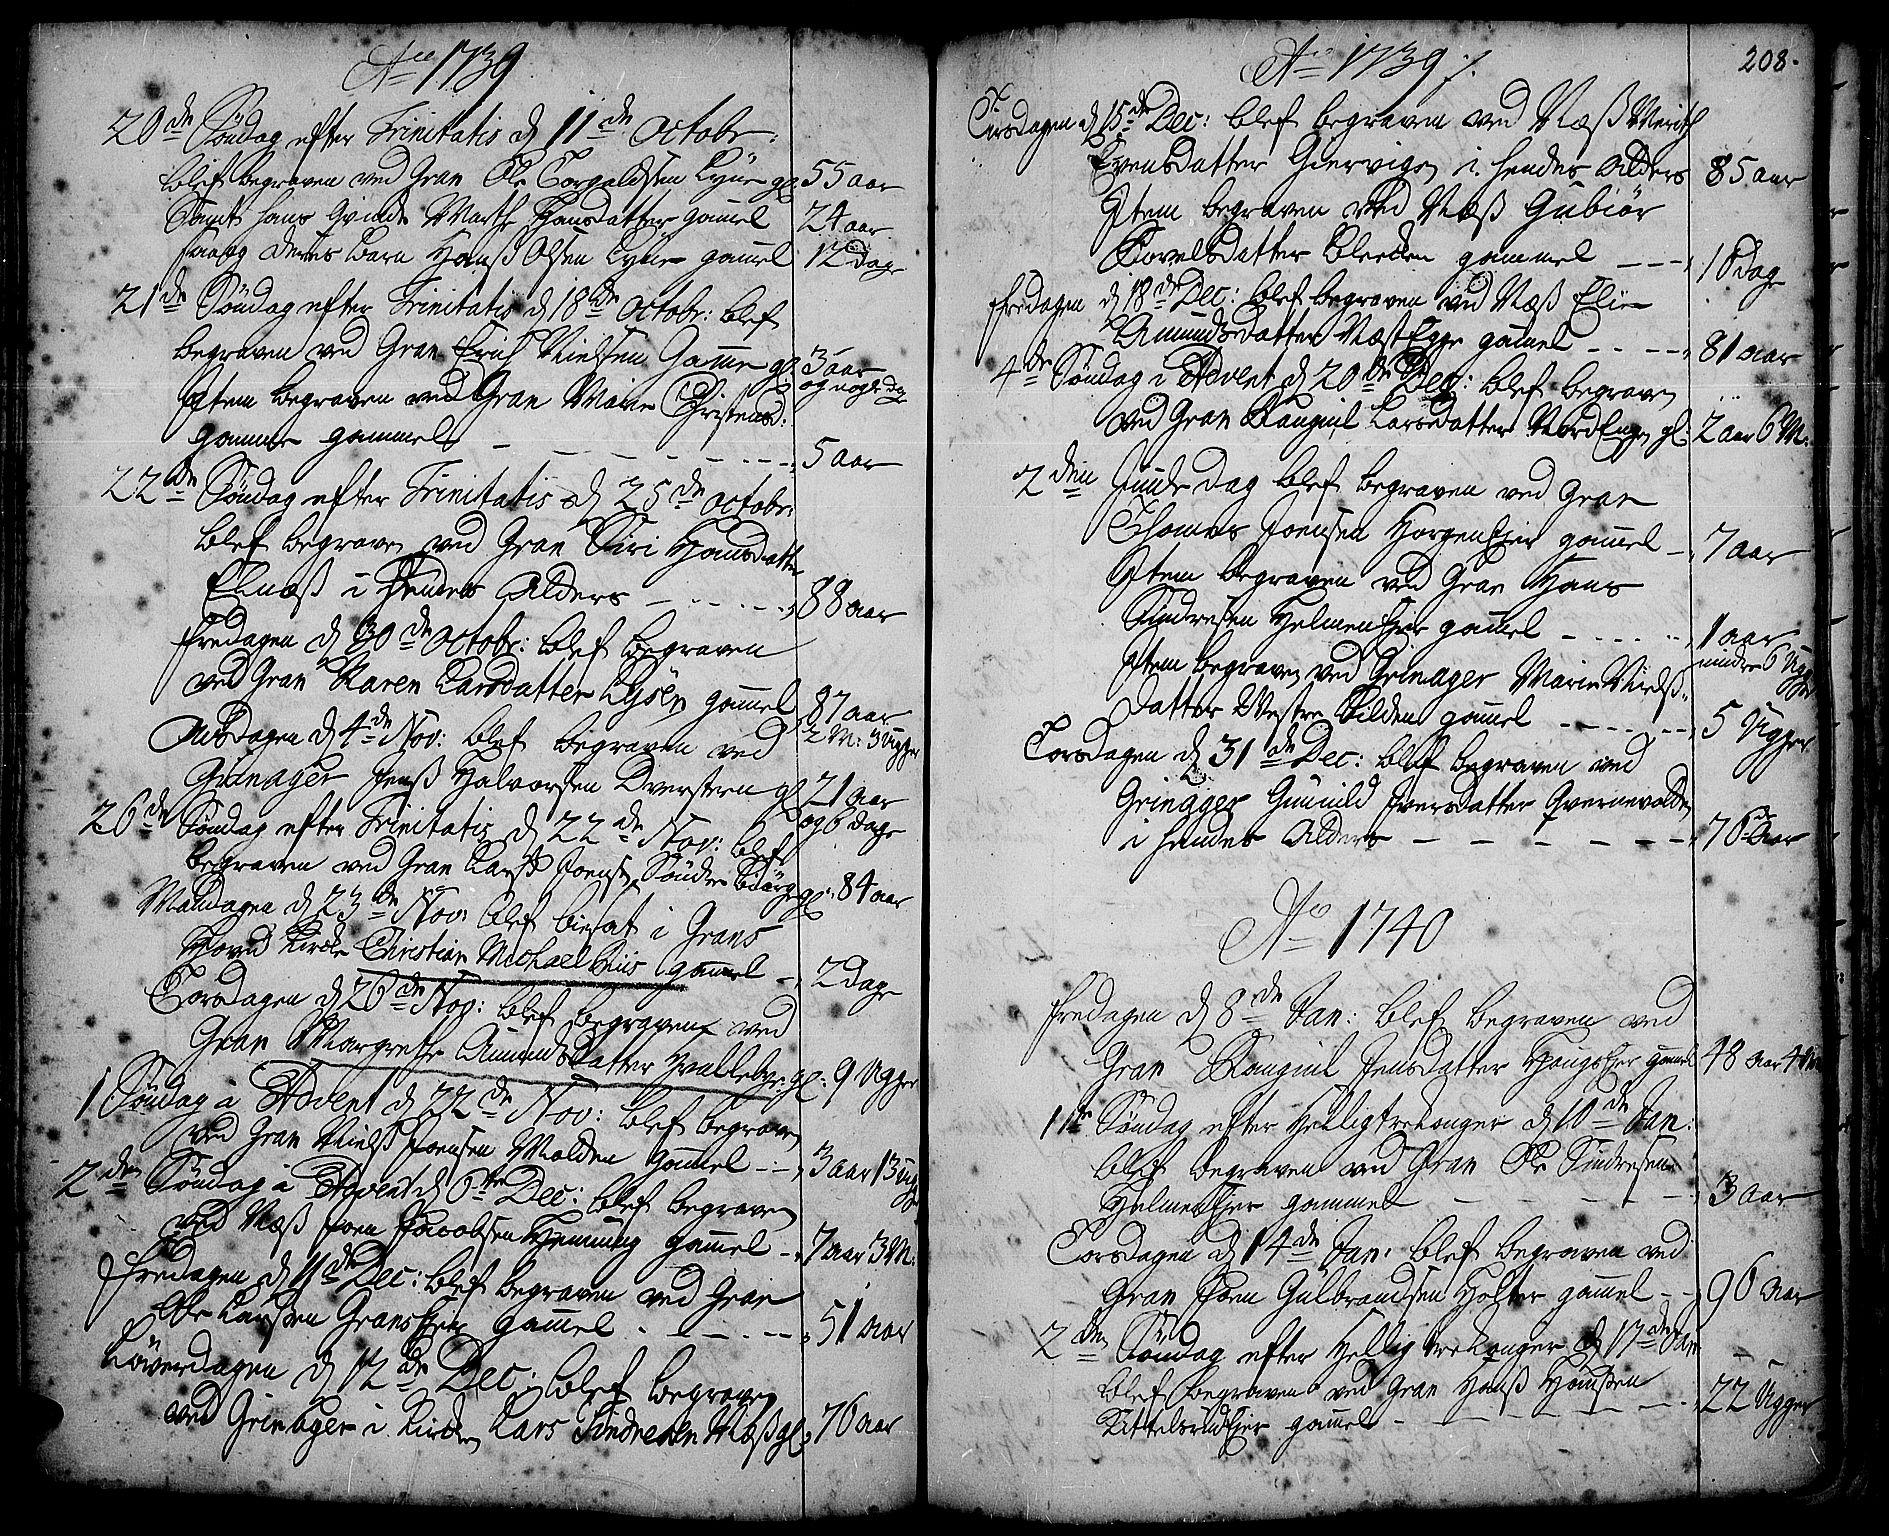 SAH, Gran prestekontor, Ministerialbok nr. 2, 1732-1744, s. 208